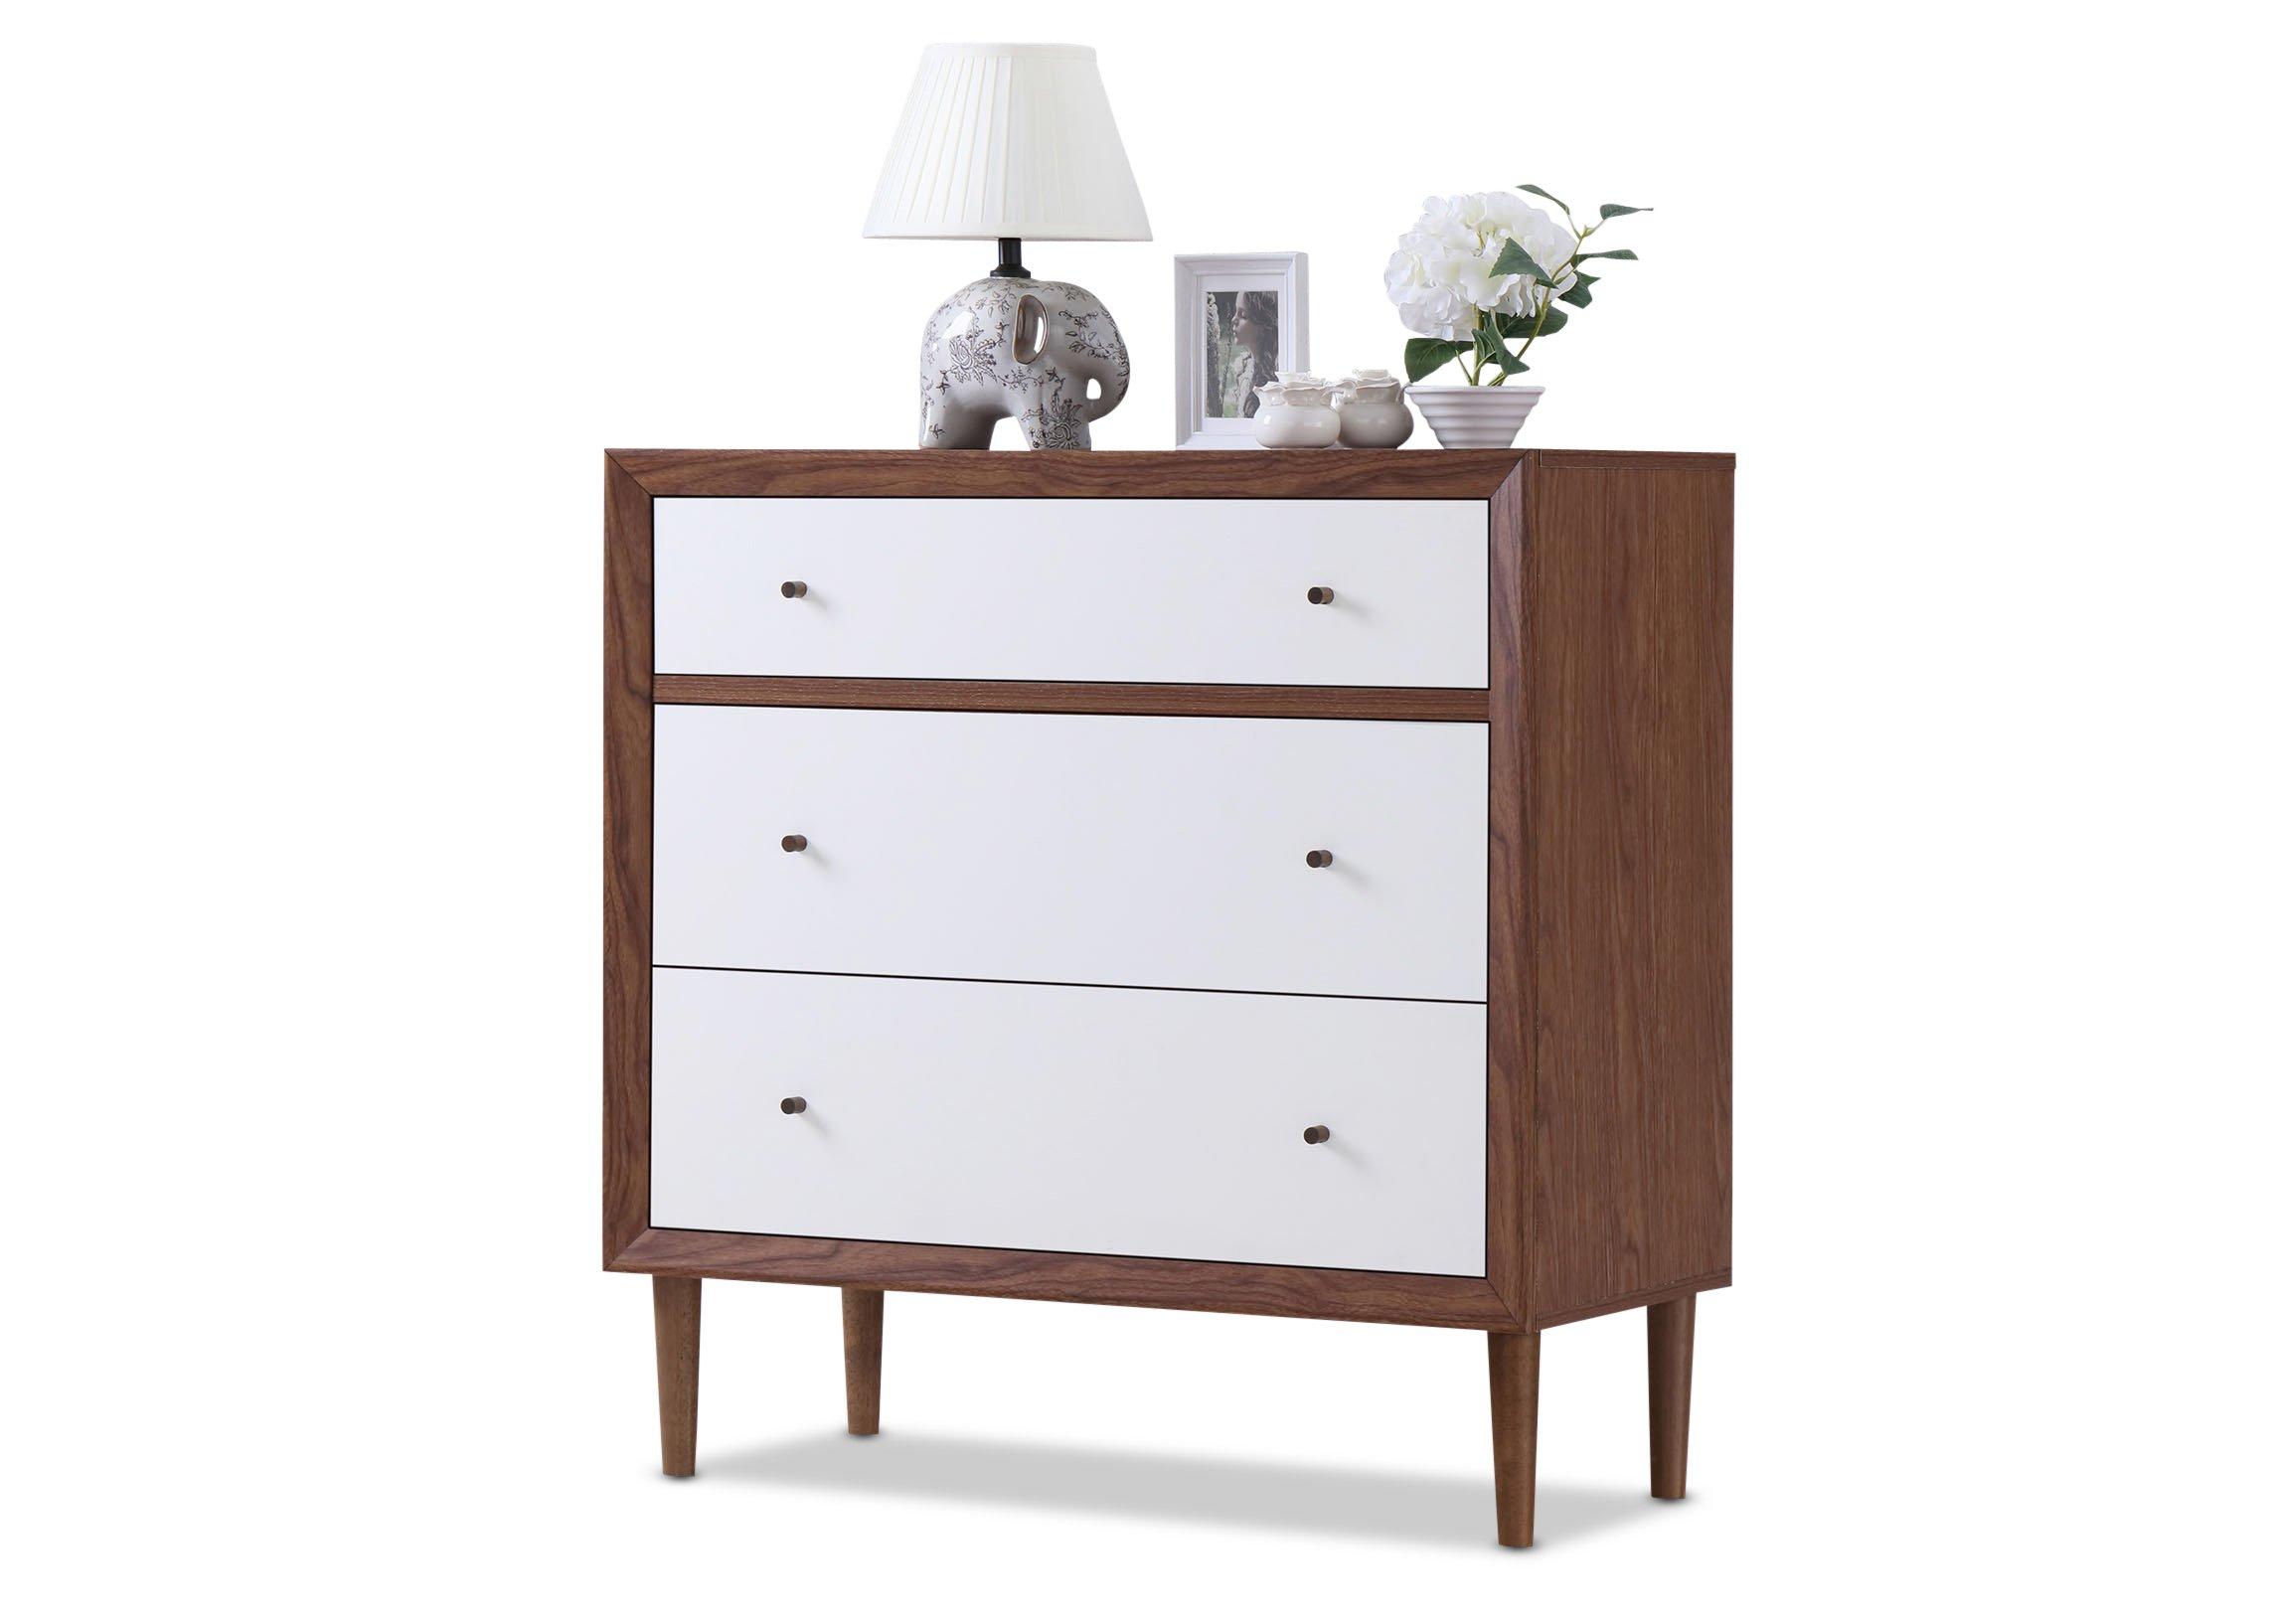 Baxton Furniture Studios Harlow Mid-Century Wood 3 Drawer Chest, Medium, White and Walnut by Baxton Studio